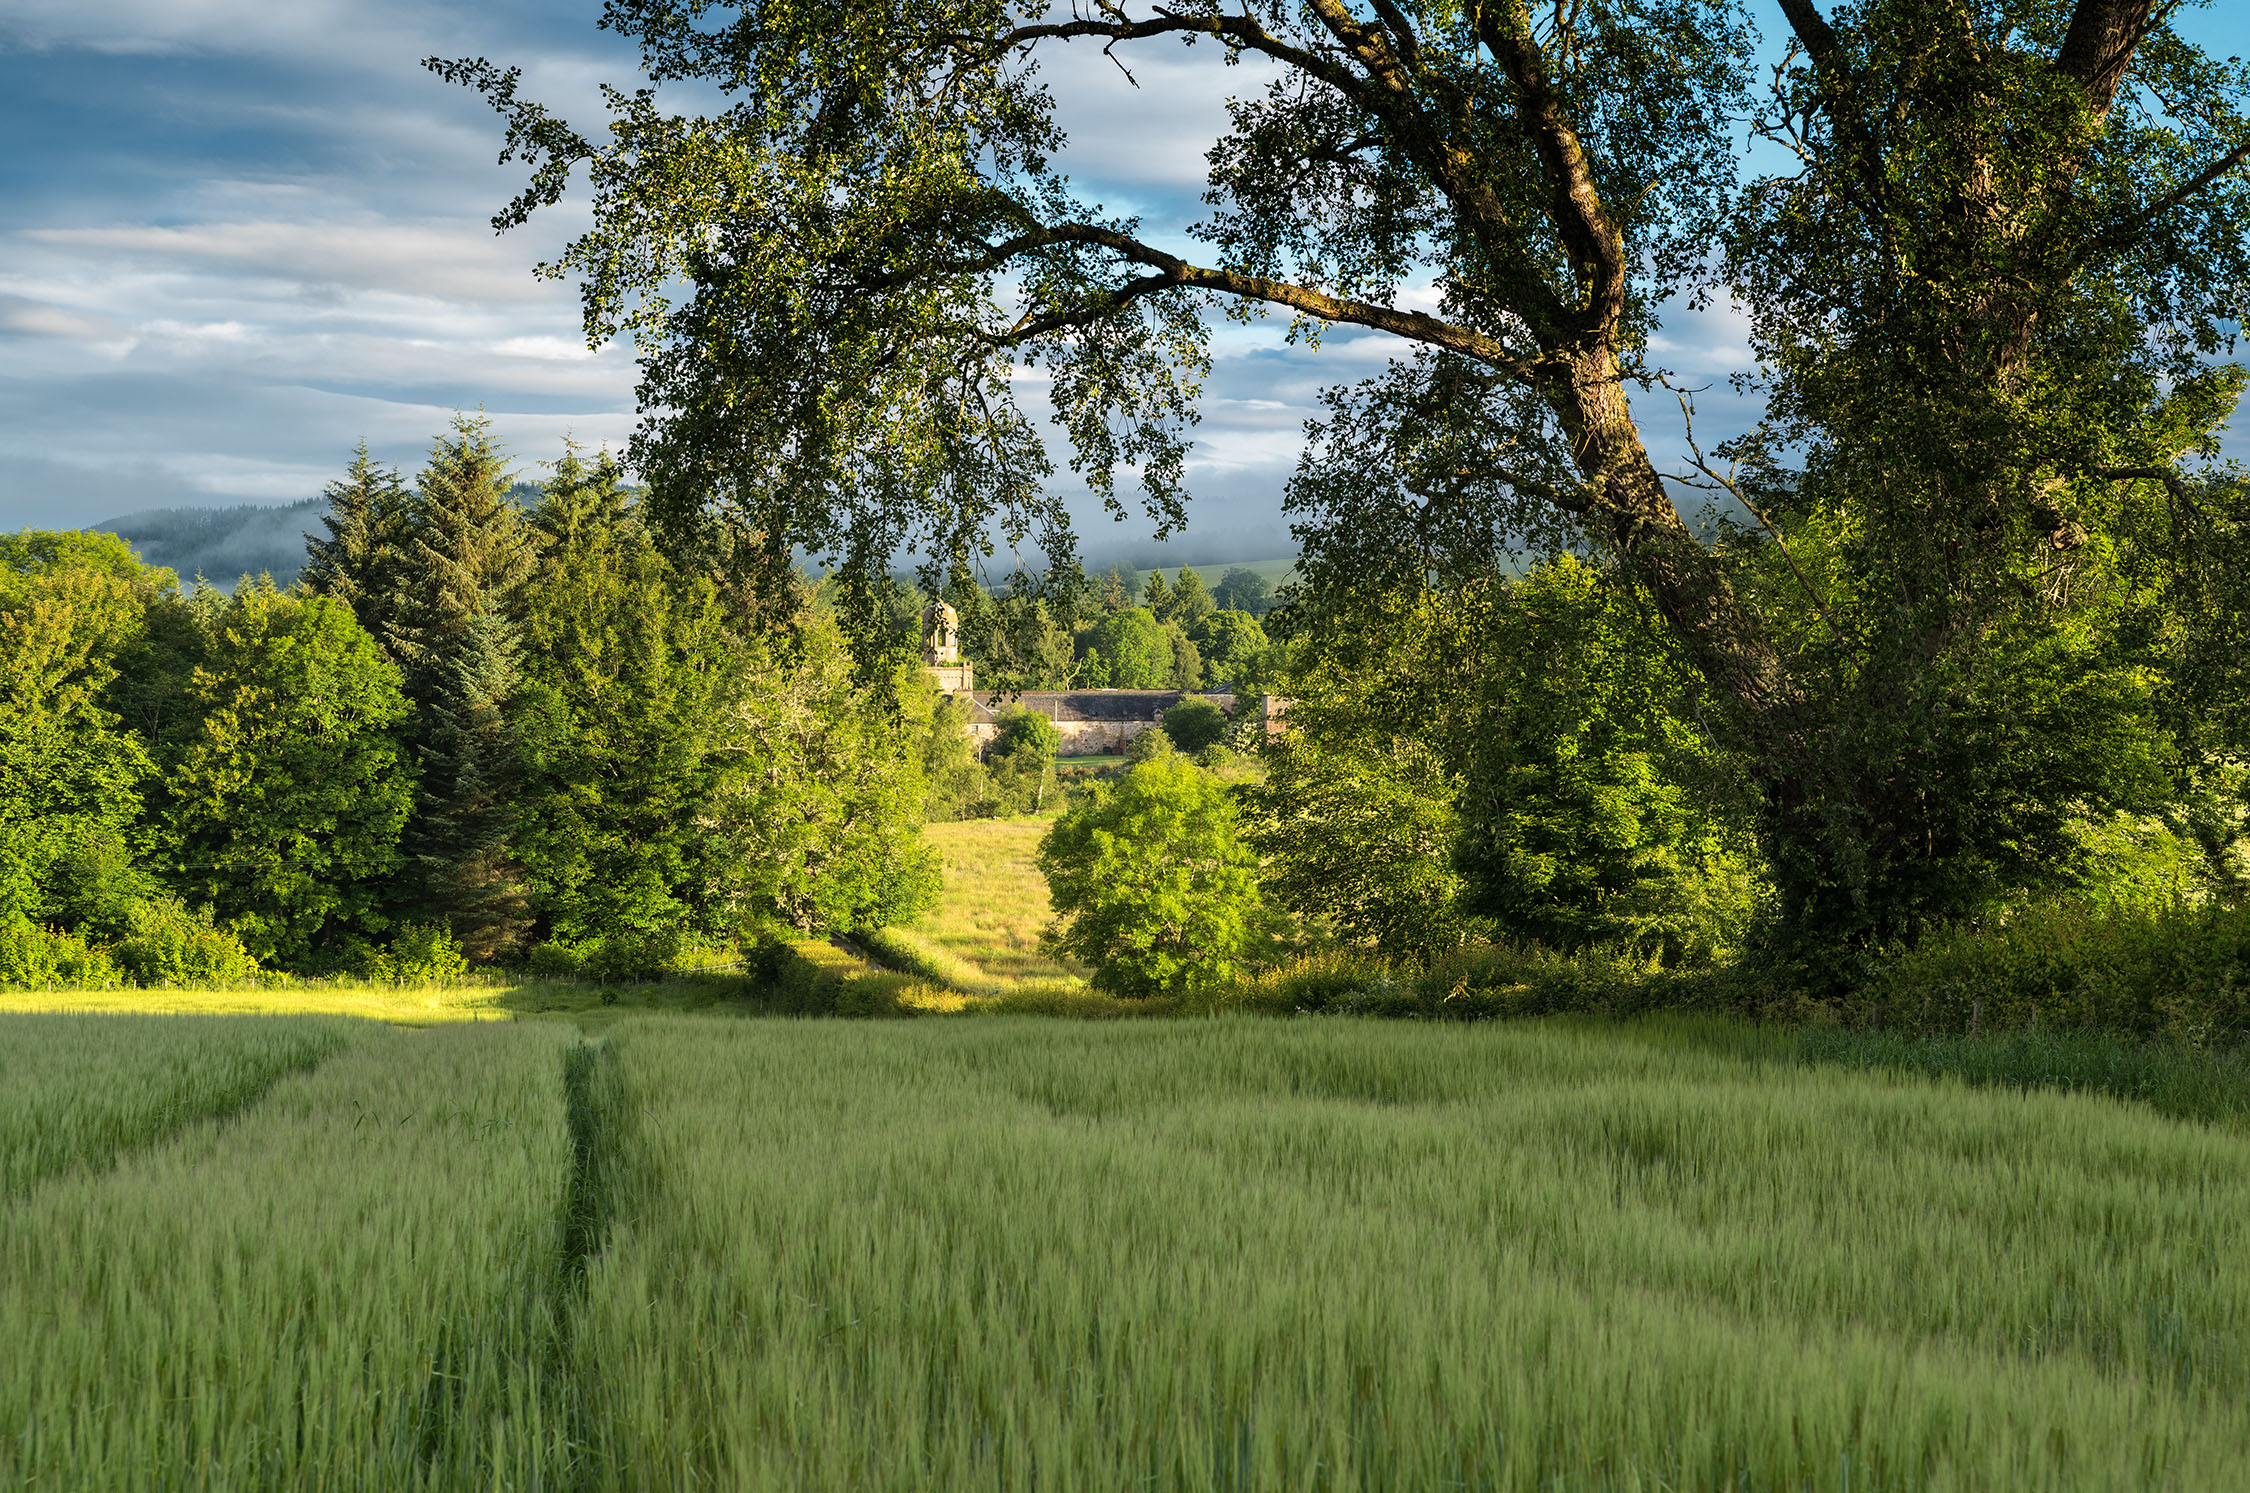 Early Morning Light - Barley Field and Logie Burn Farm, Muir of Ord. Leica S2. Bob Hamilton